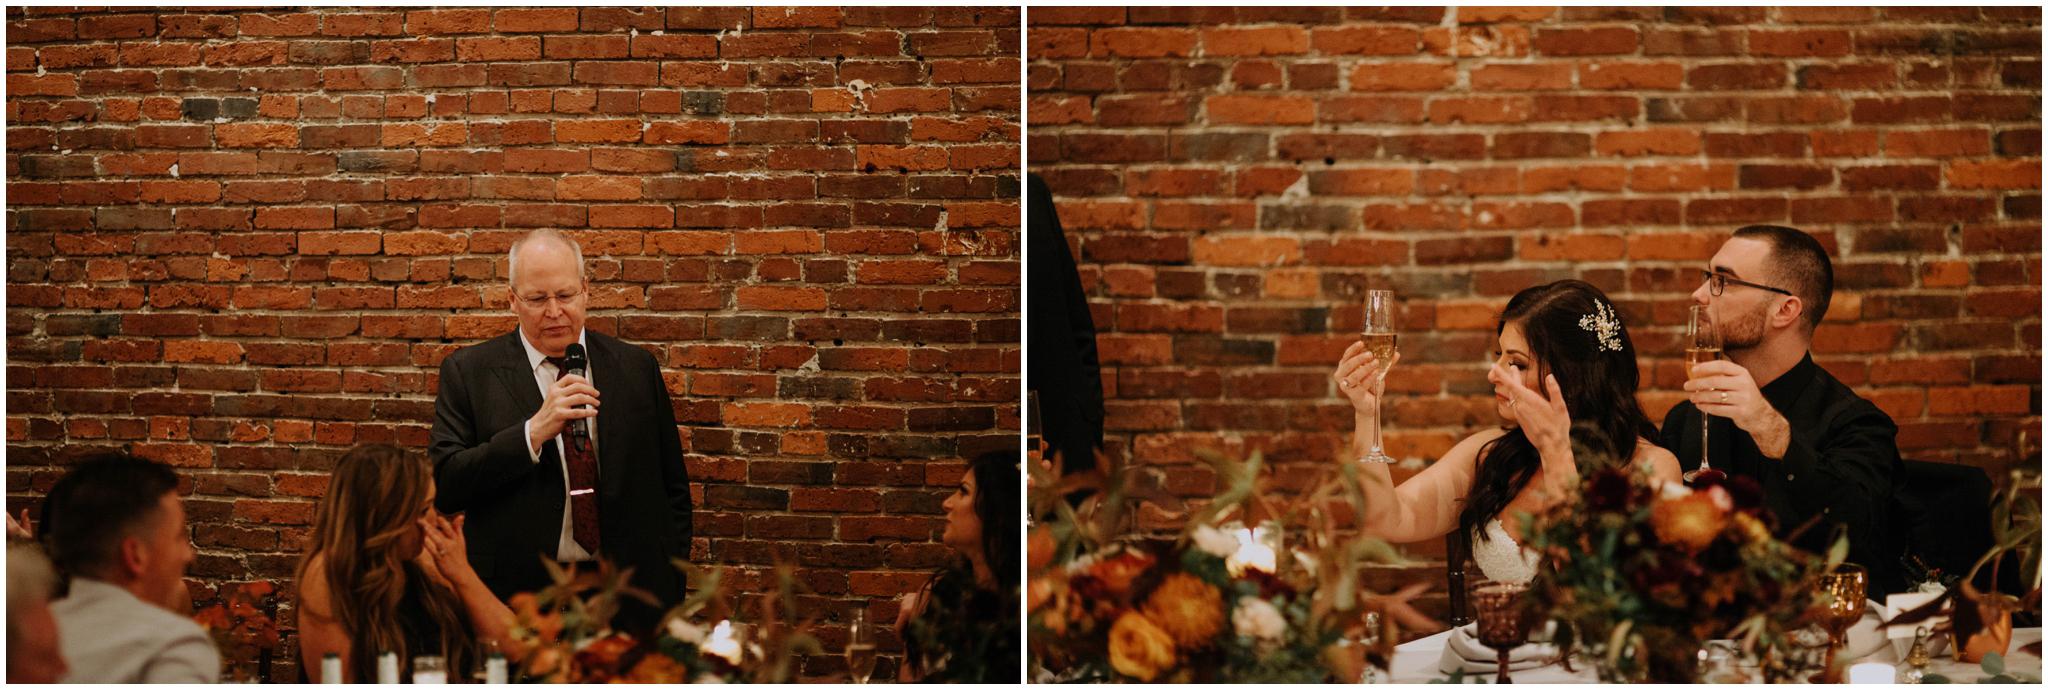 danny+mackenzie+downtown-seattle-axis-wedding-seattle-photographer-104.jpg